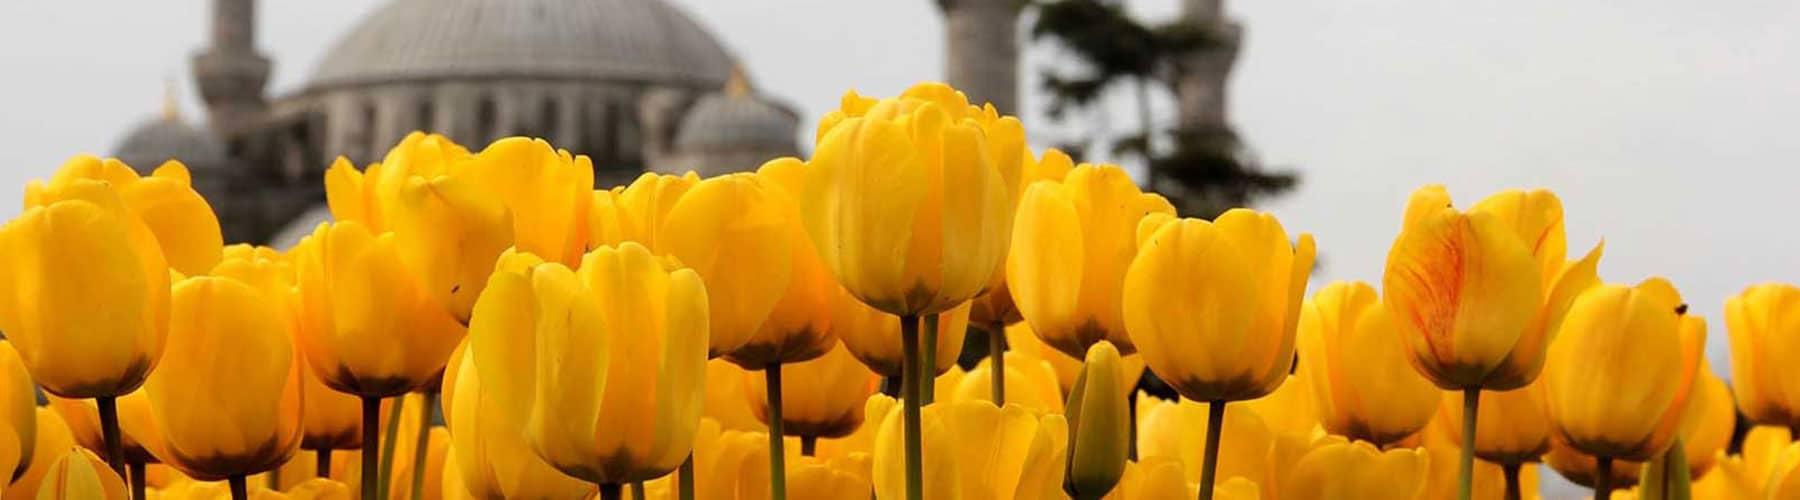 Istanbul Tulips in April